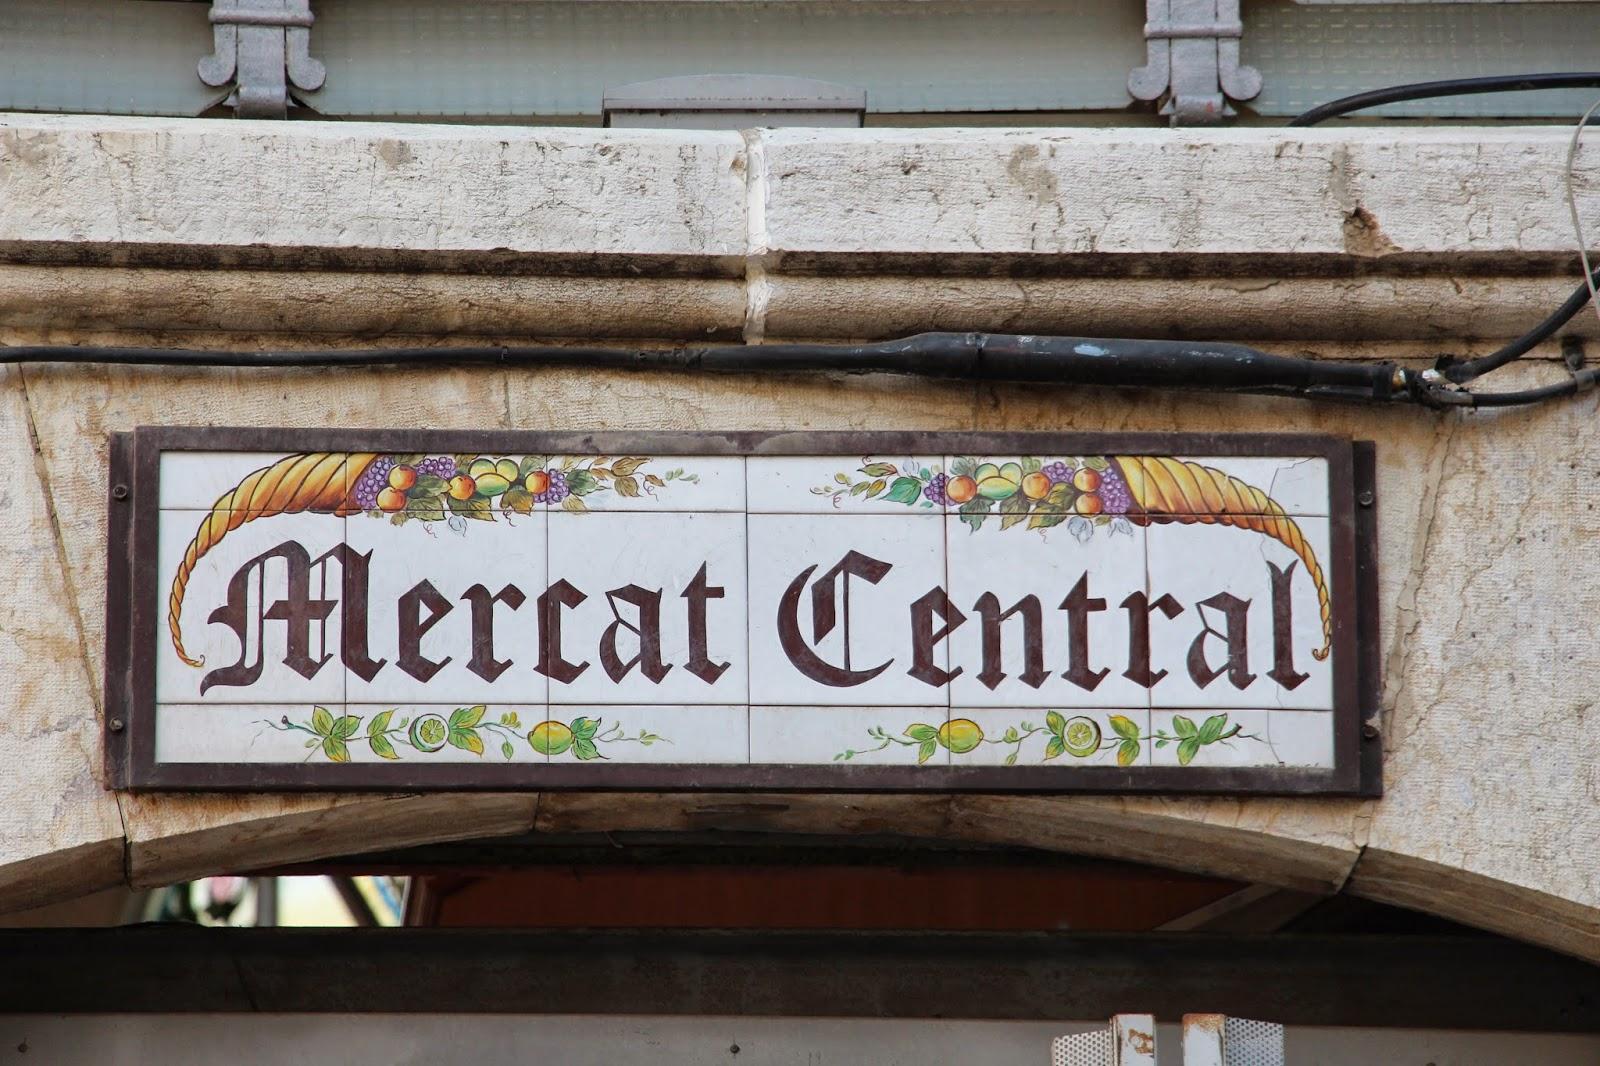 Valencia Mercat Central